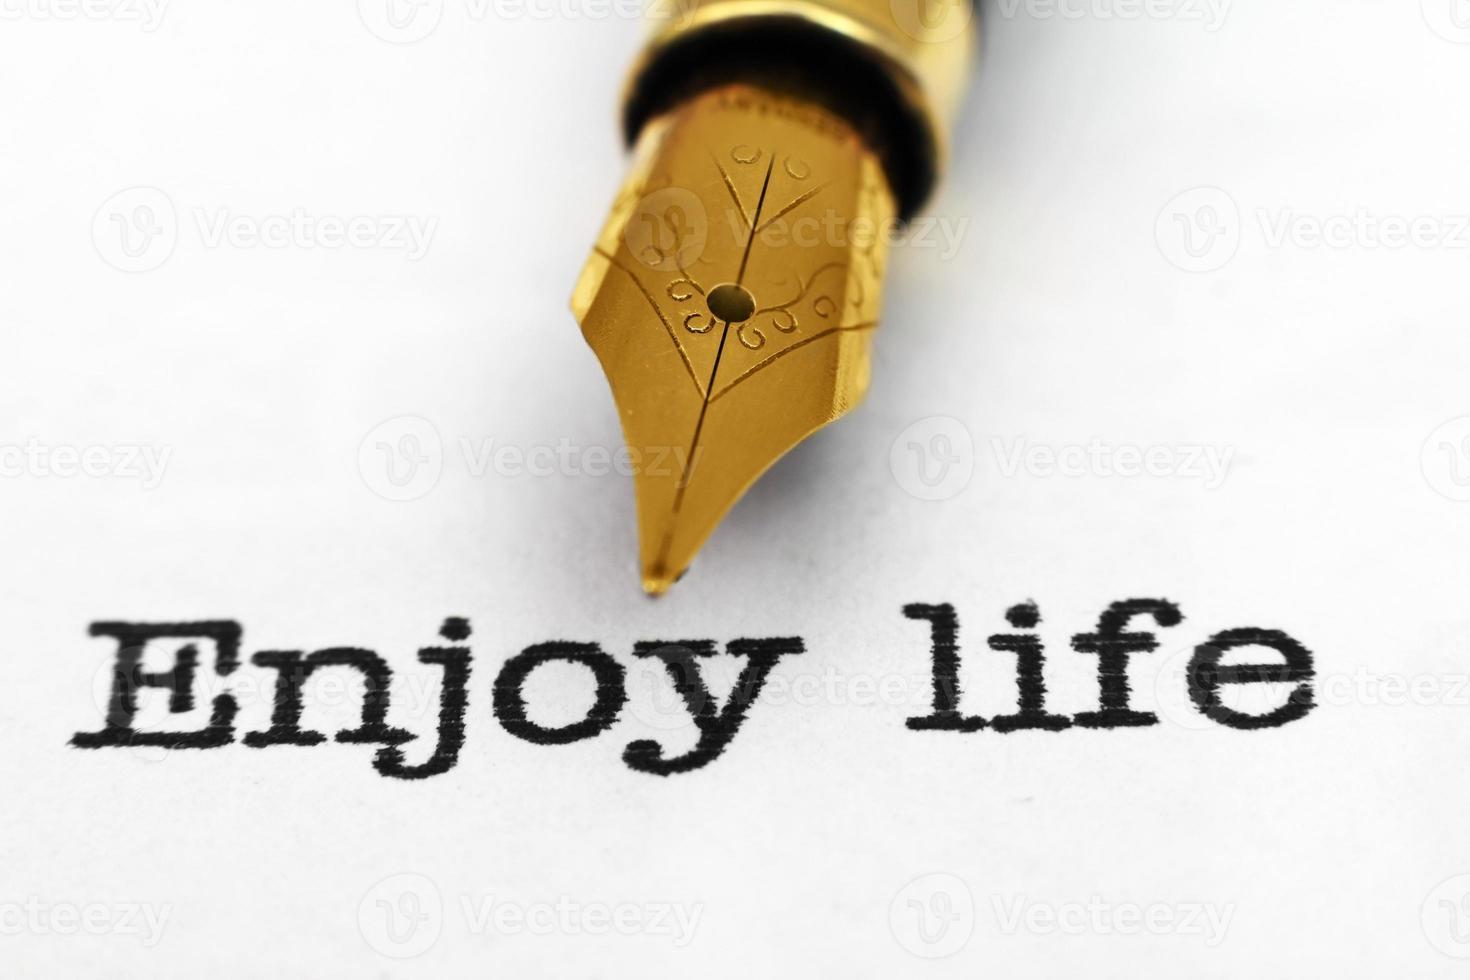 Enjoy life photo